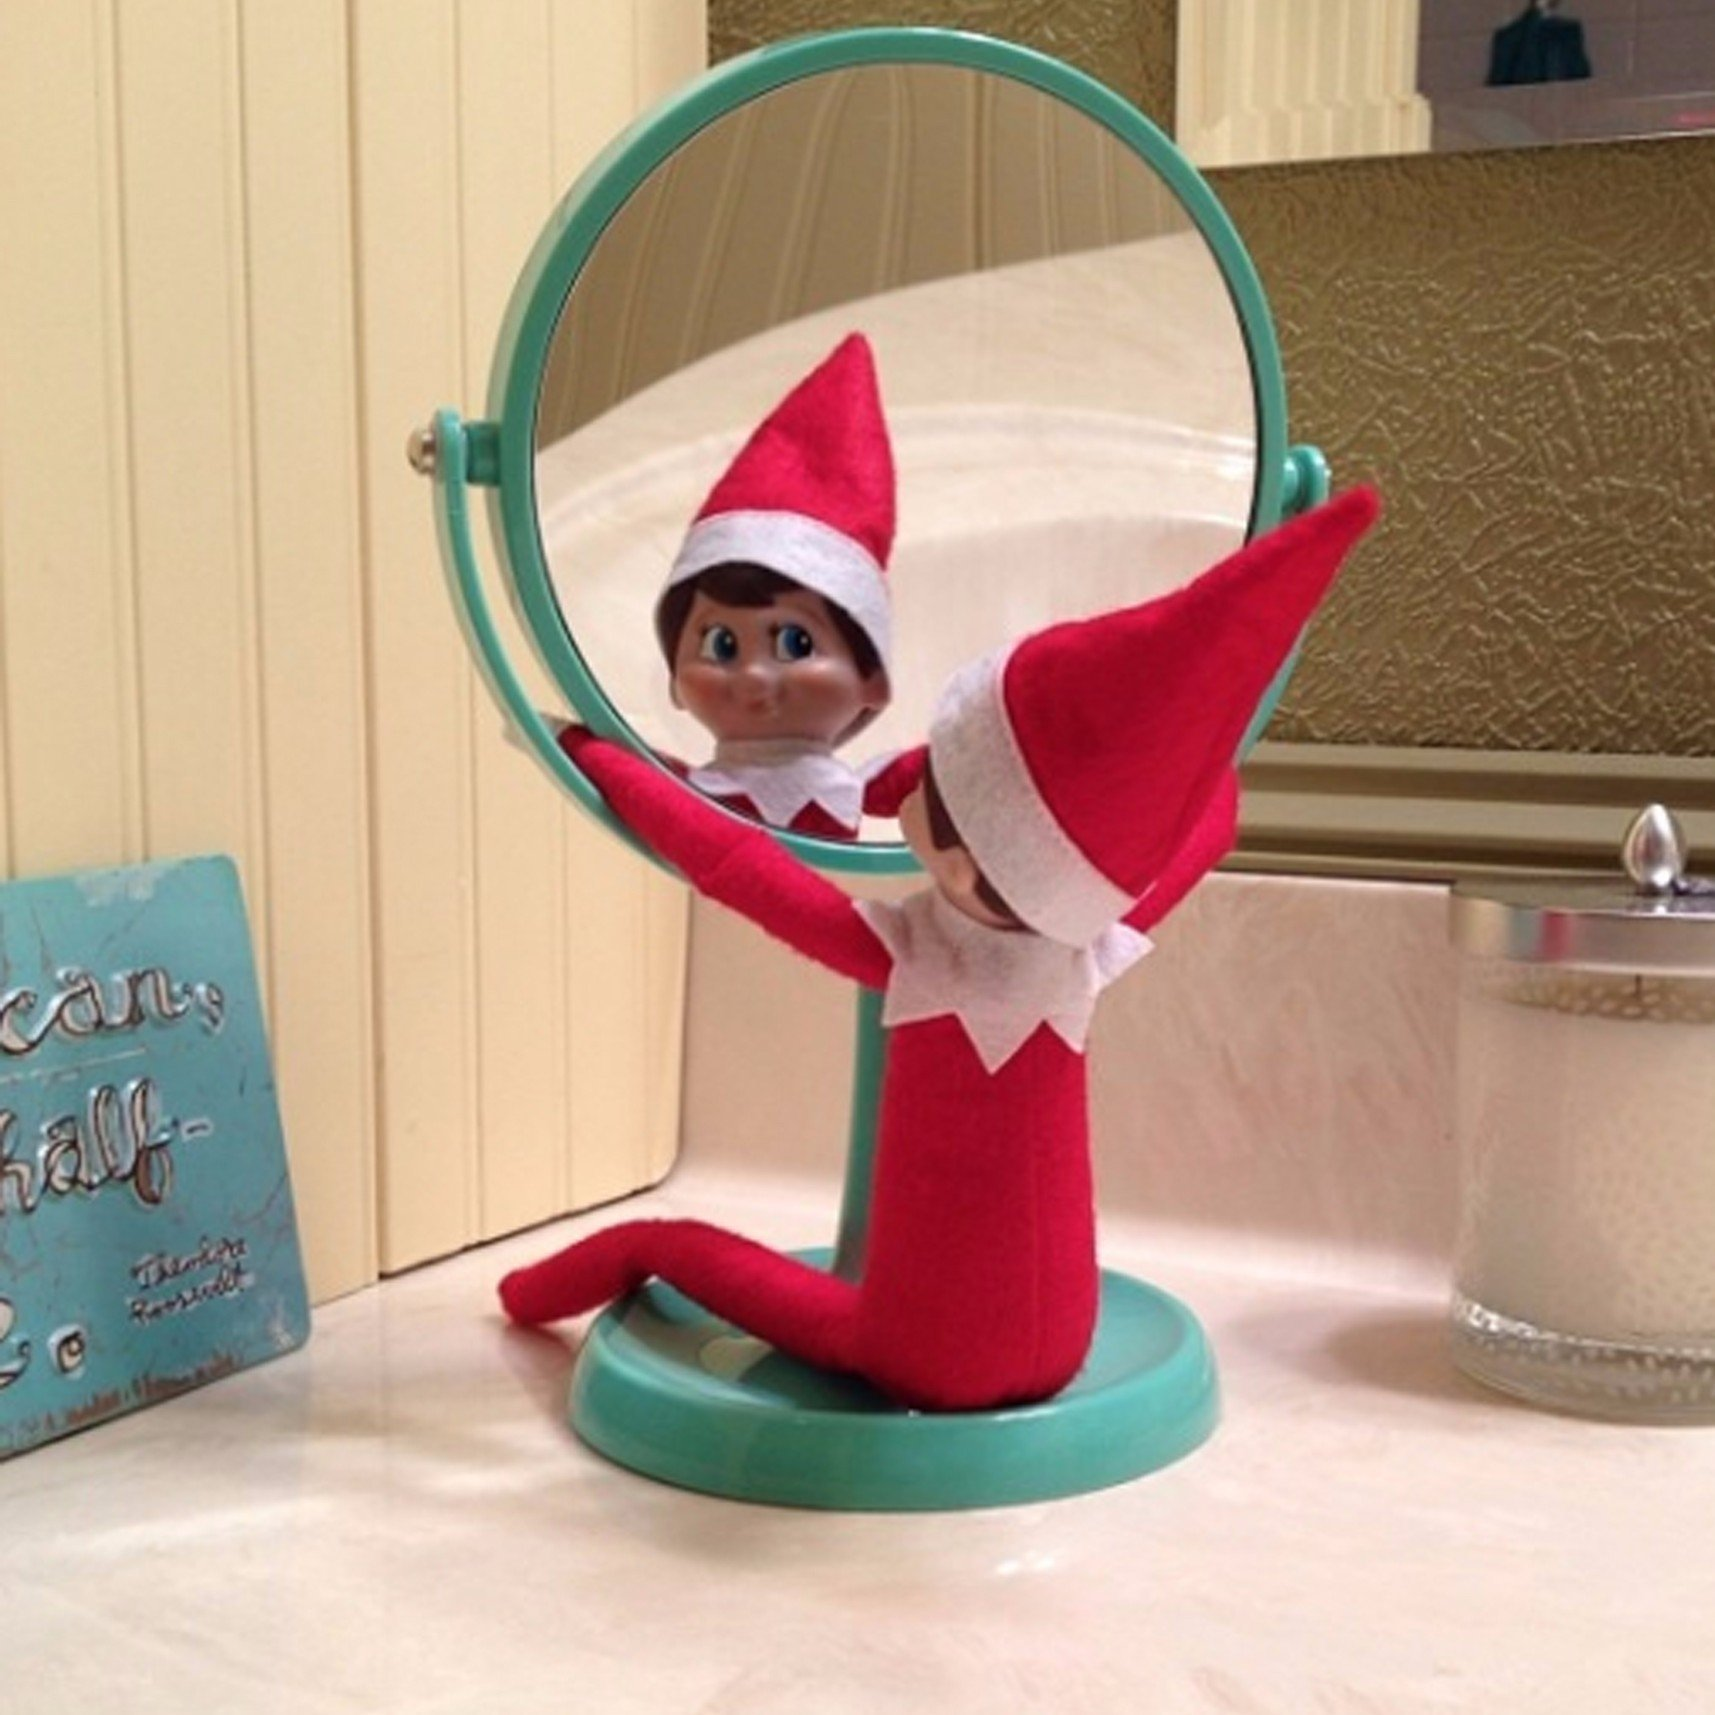 10 Pretty Elf On The Shelf Idea easy elf on the shelf ideas popsugar moms 1 2020